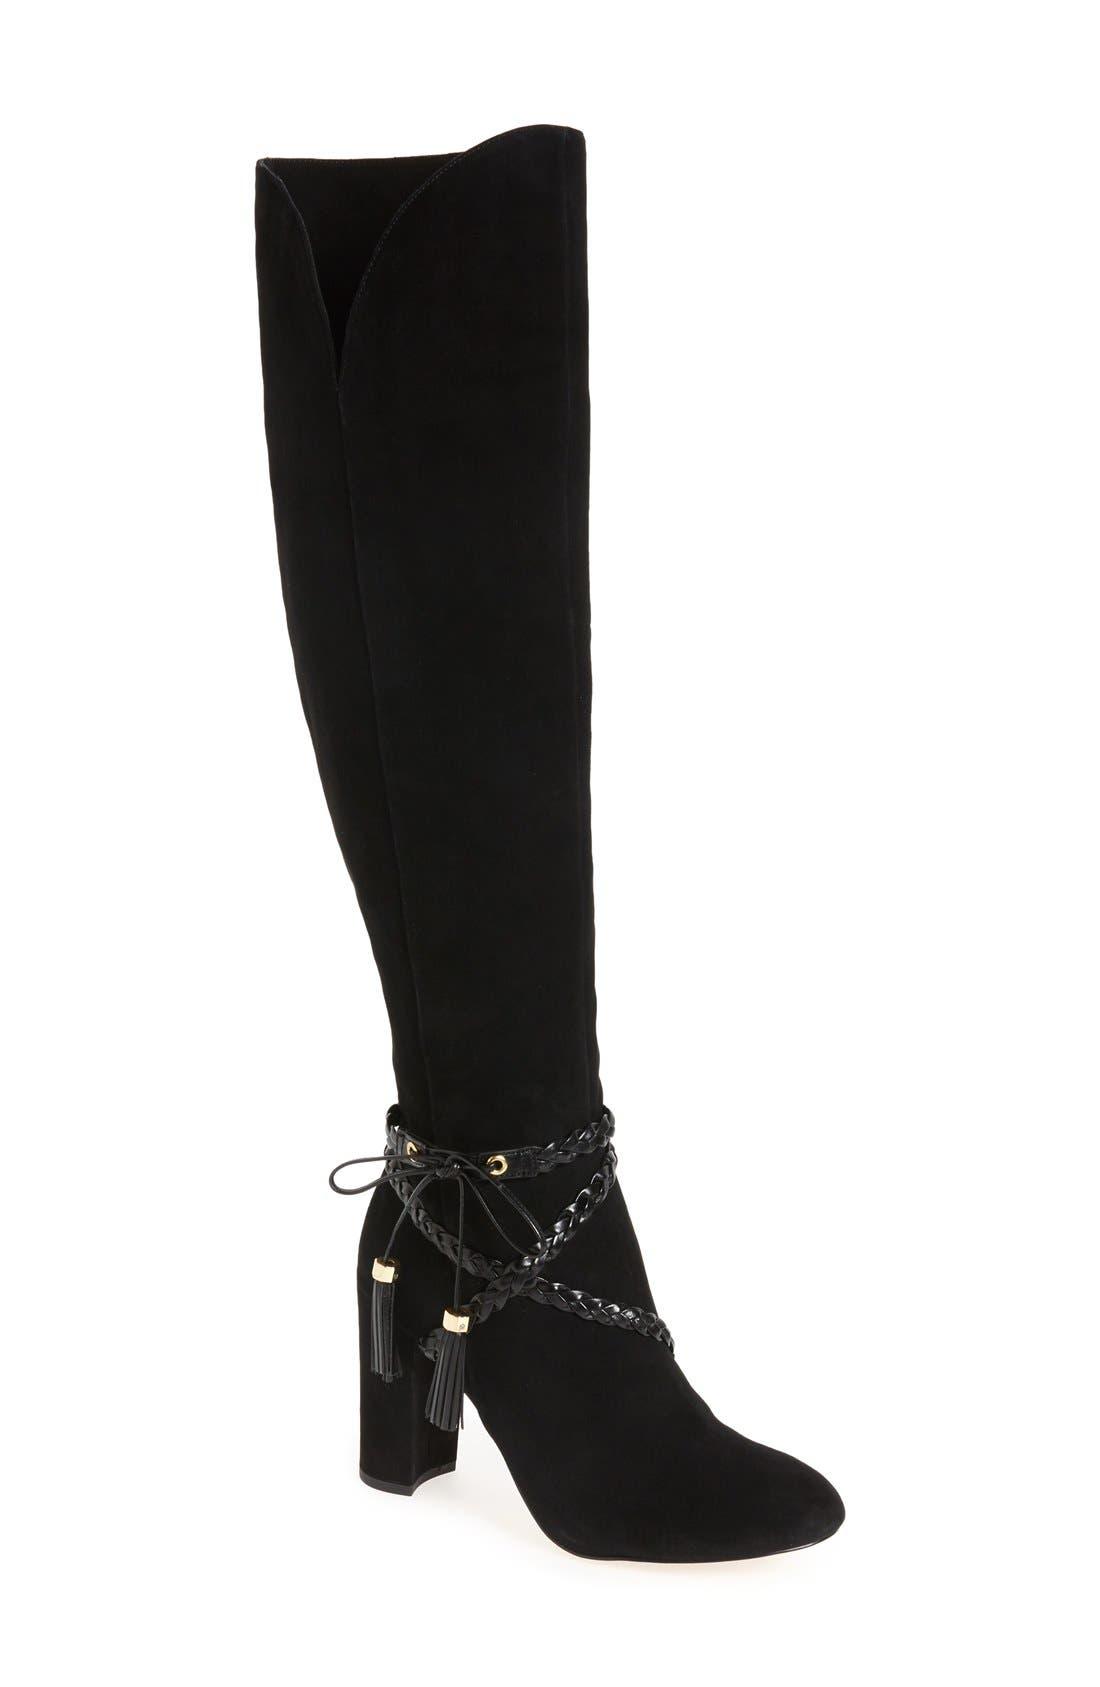 Main Image - Louise et Cie 'Tallen' Over the Knee Boot (Women) (Wide Calf)